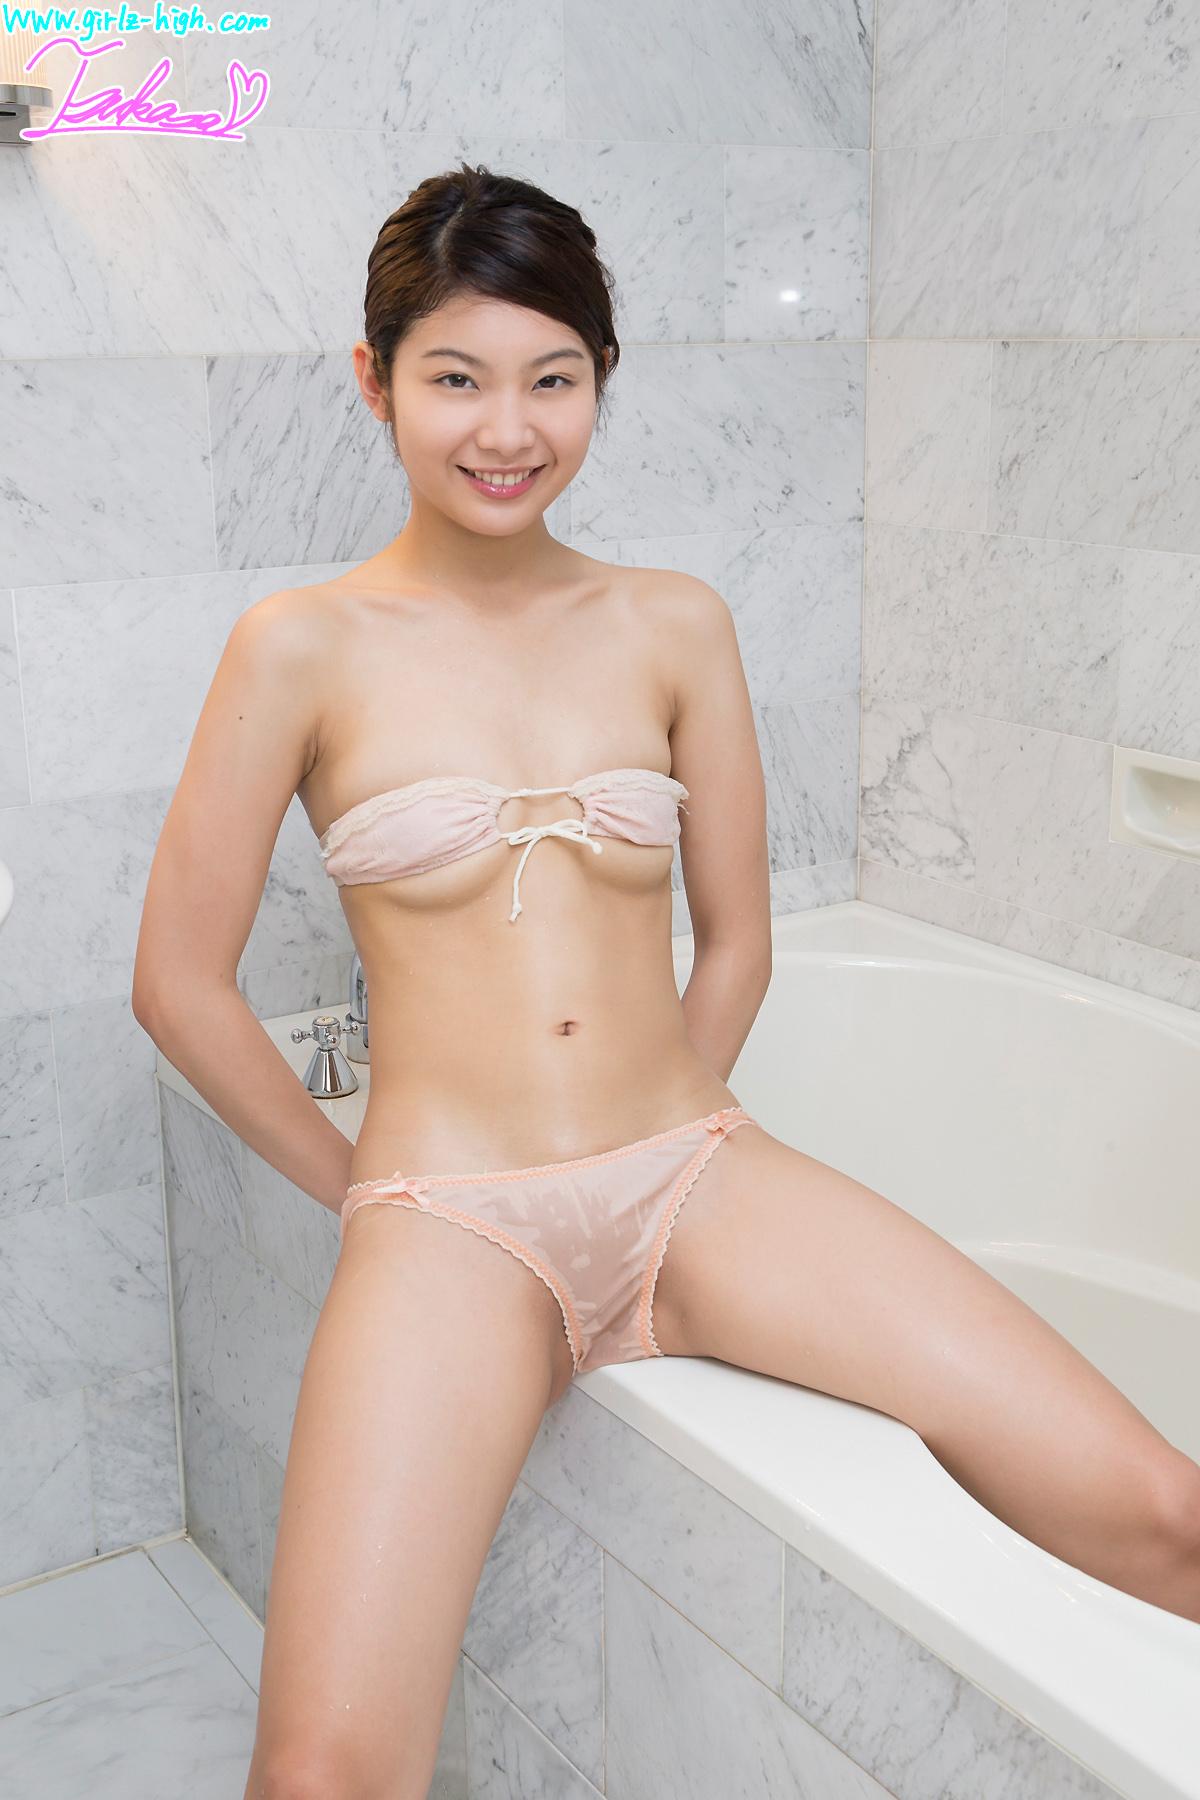 minisuka tv  asami  kondou  5   0 WEB Gravure : ( [Minisuka.tv] - | 2015.07.16 Limited Gallery